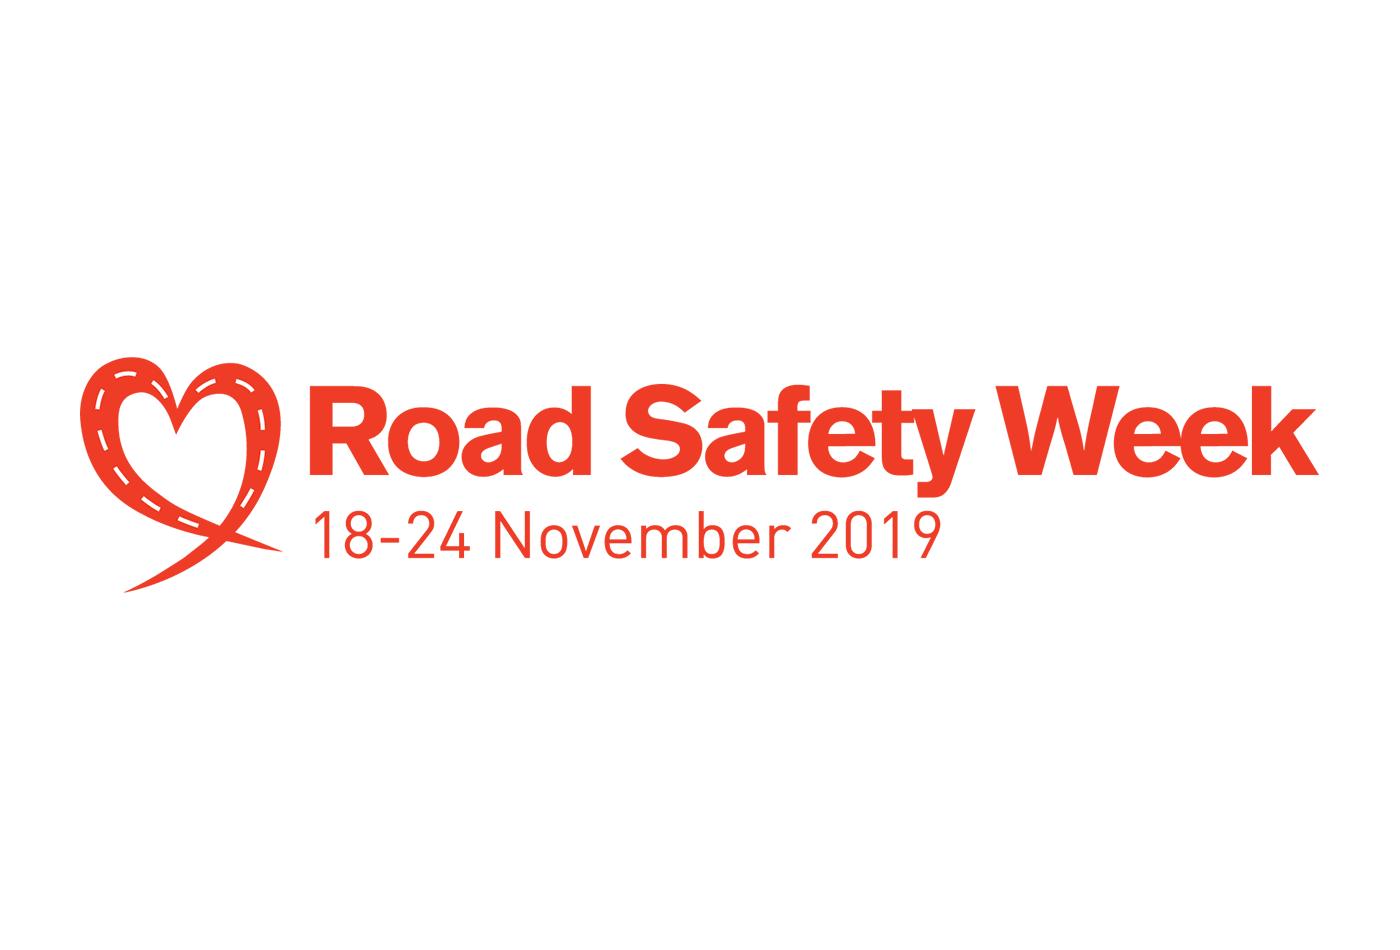 Road Safety Week 2019